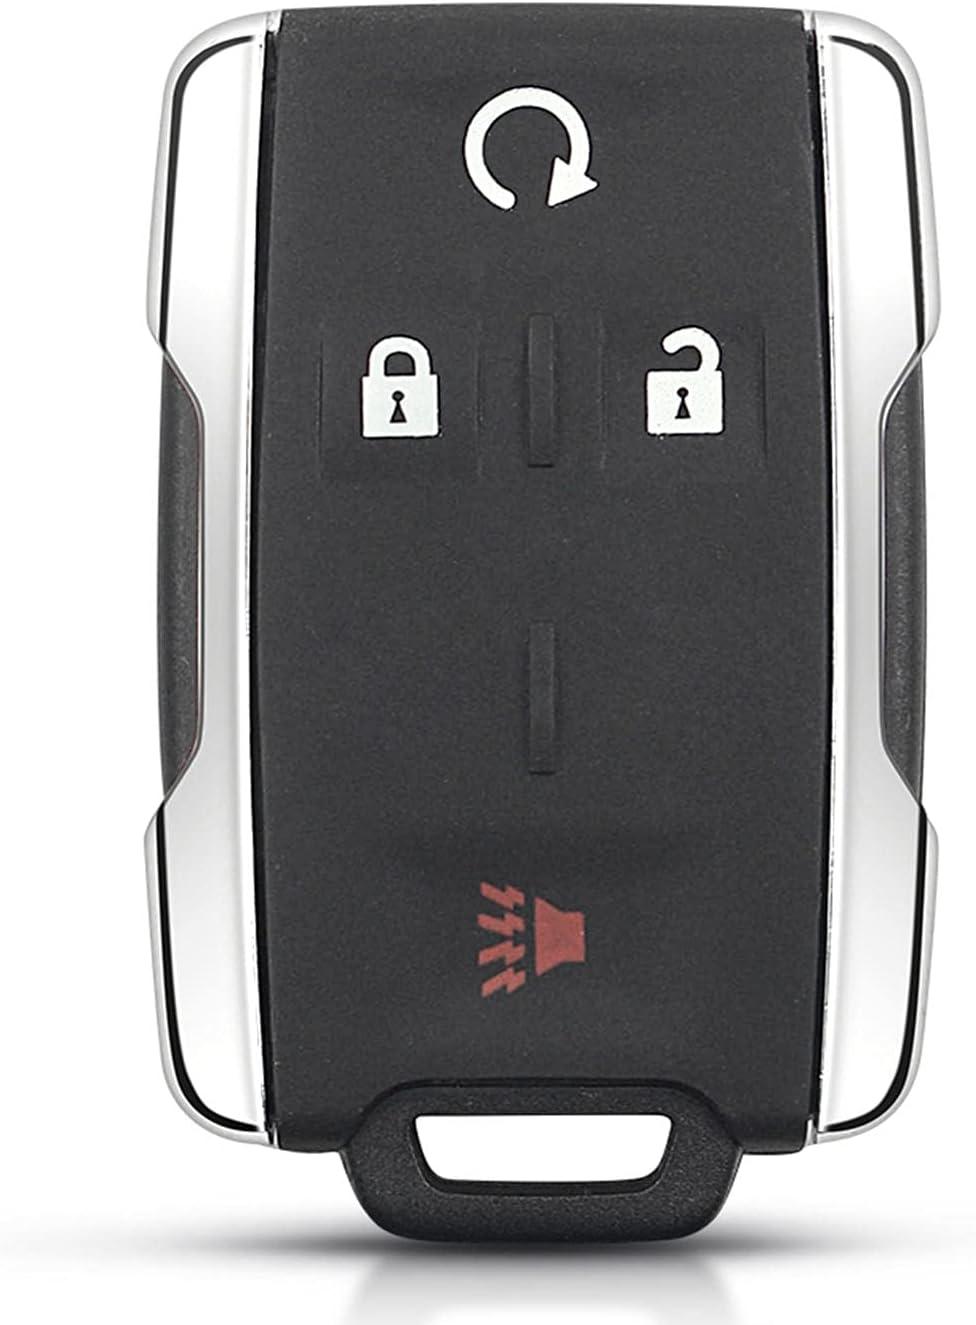 FLJKCT Smart Key Shell Jacksonville Mall Housing Case Remote Keyless Entry fo Factory outlet